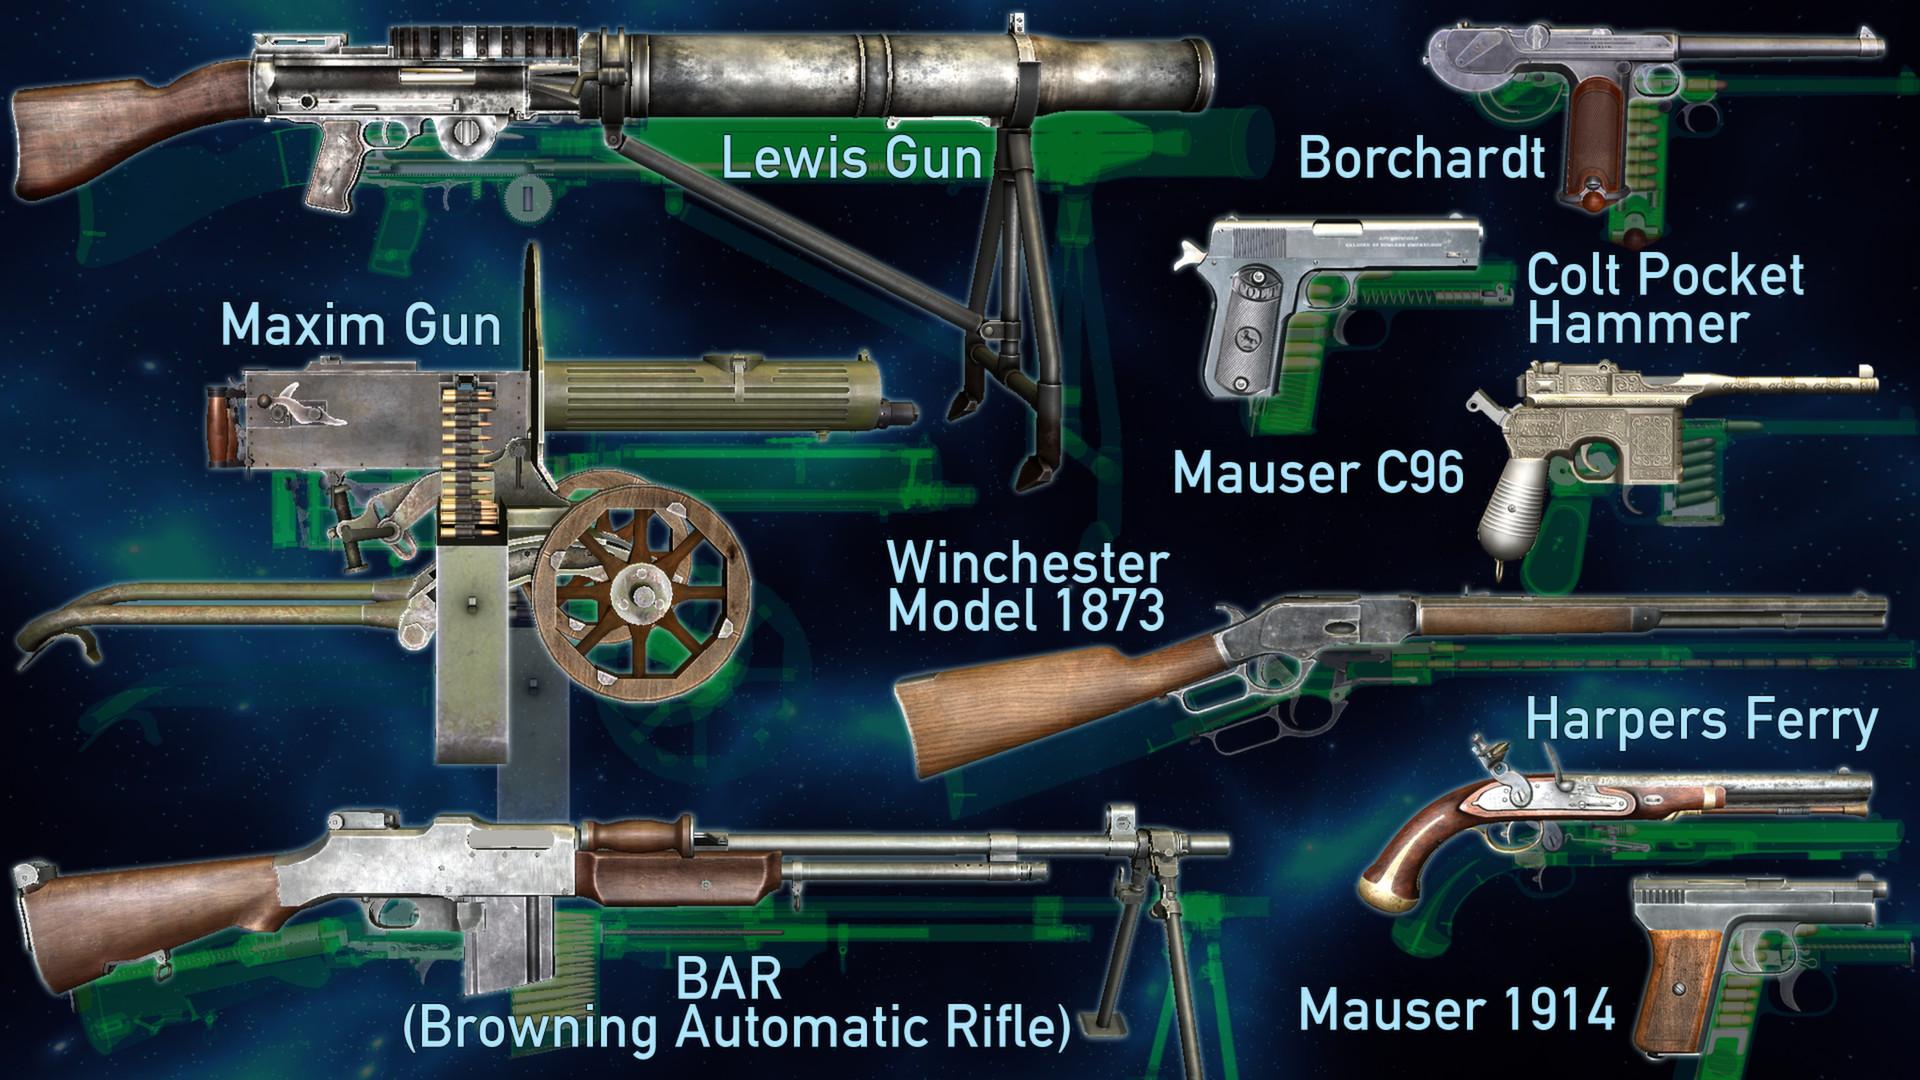 World Of Guns Gun Disassembly On Steam Mosin Nagant Schematic